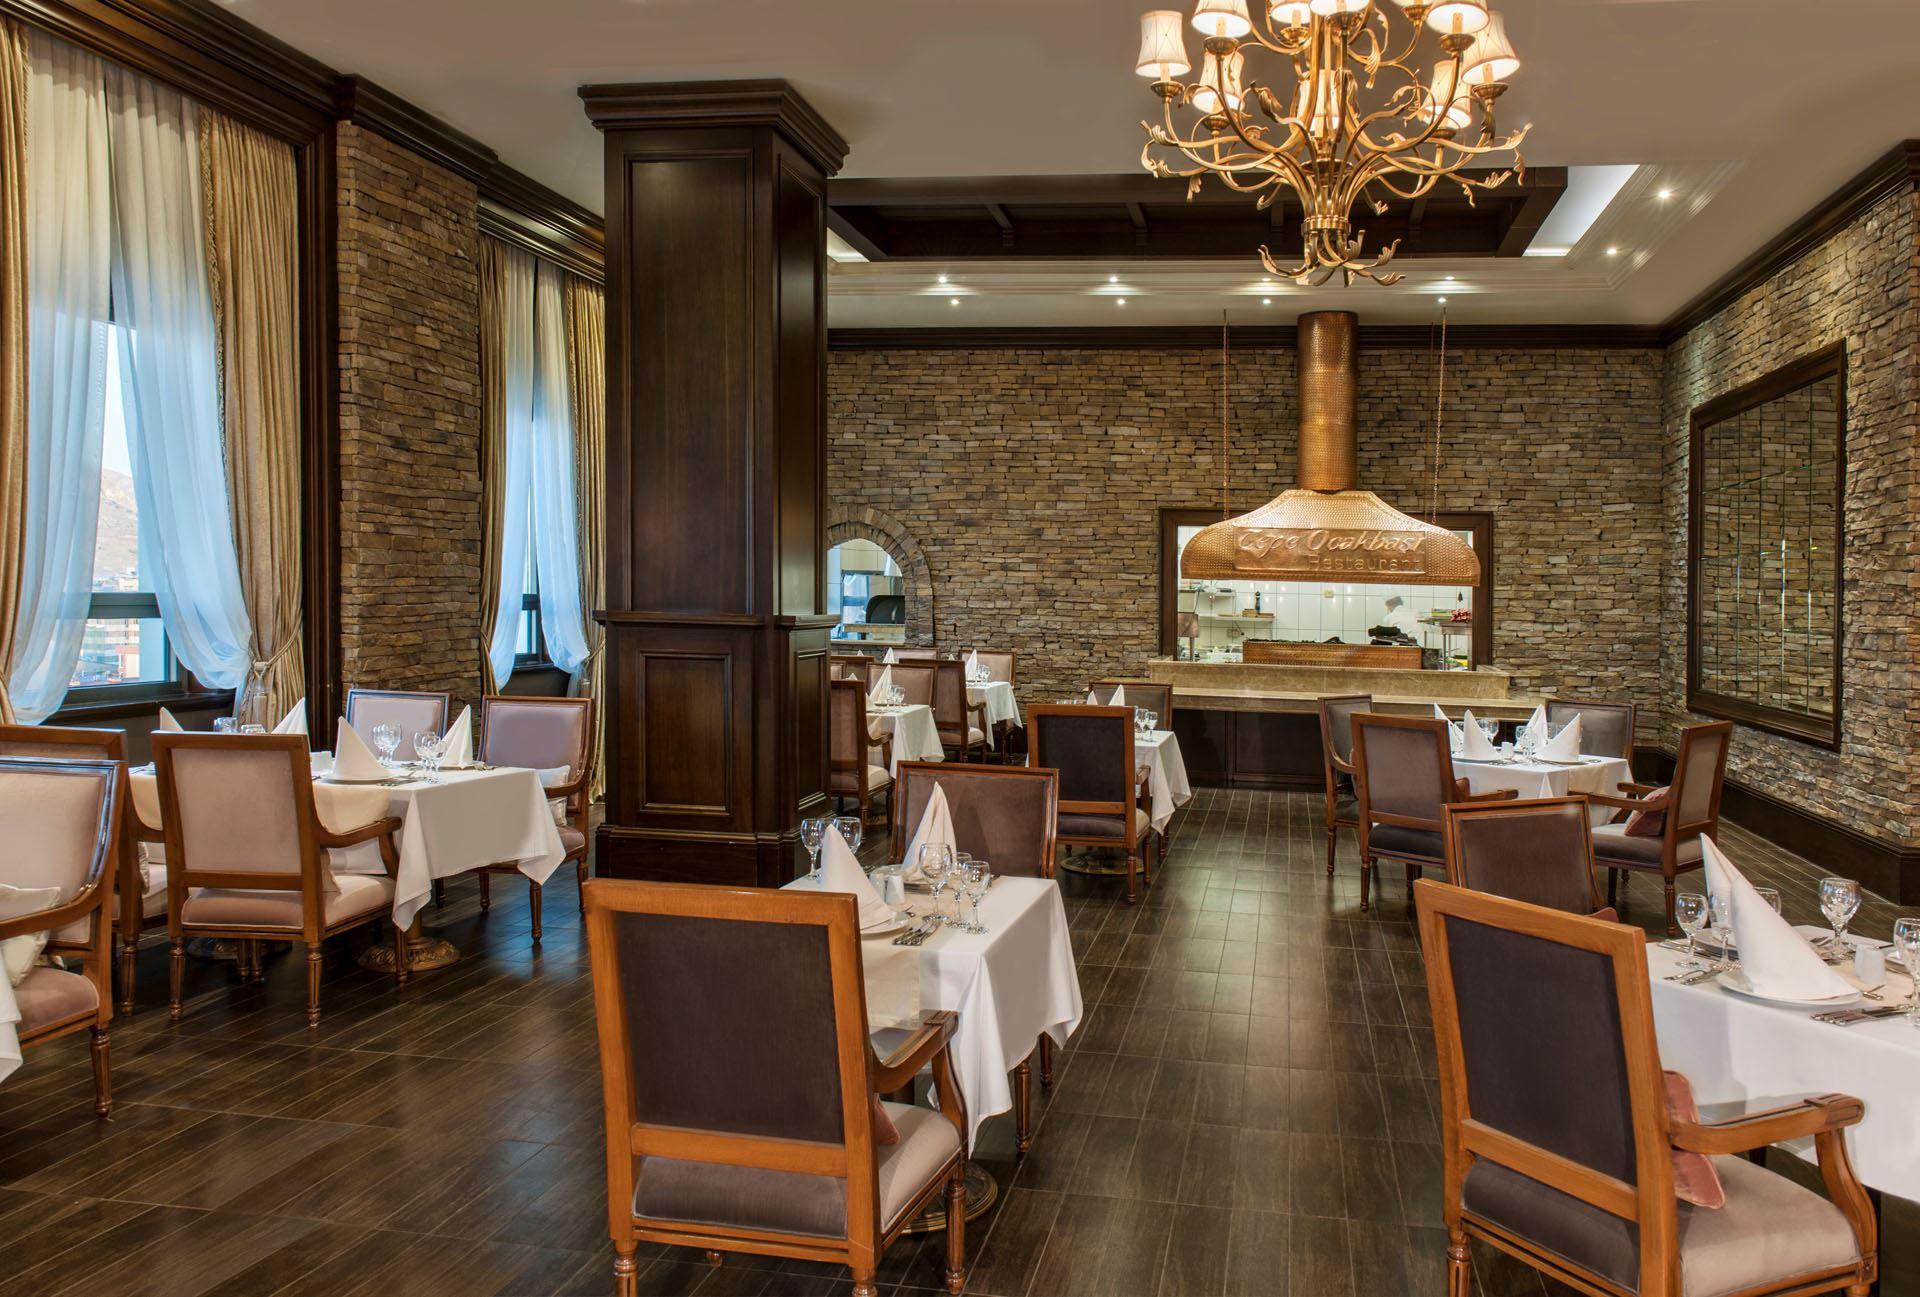 Tepe-Ocakbaşı رستوران ها و کافه های شهر وان